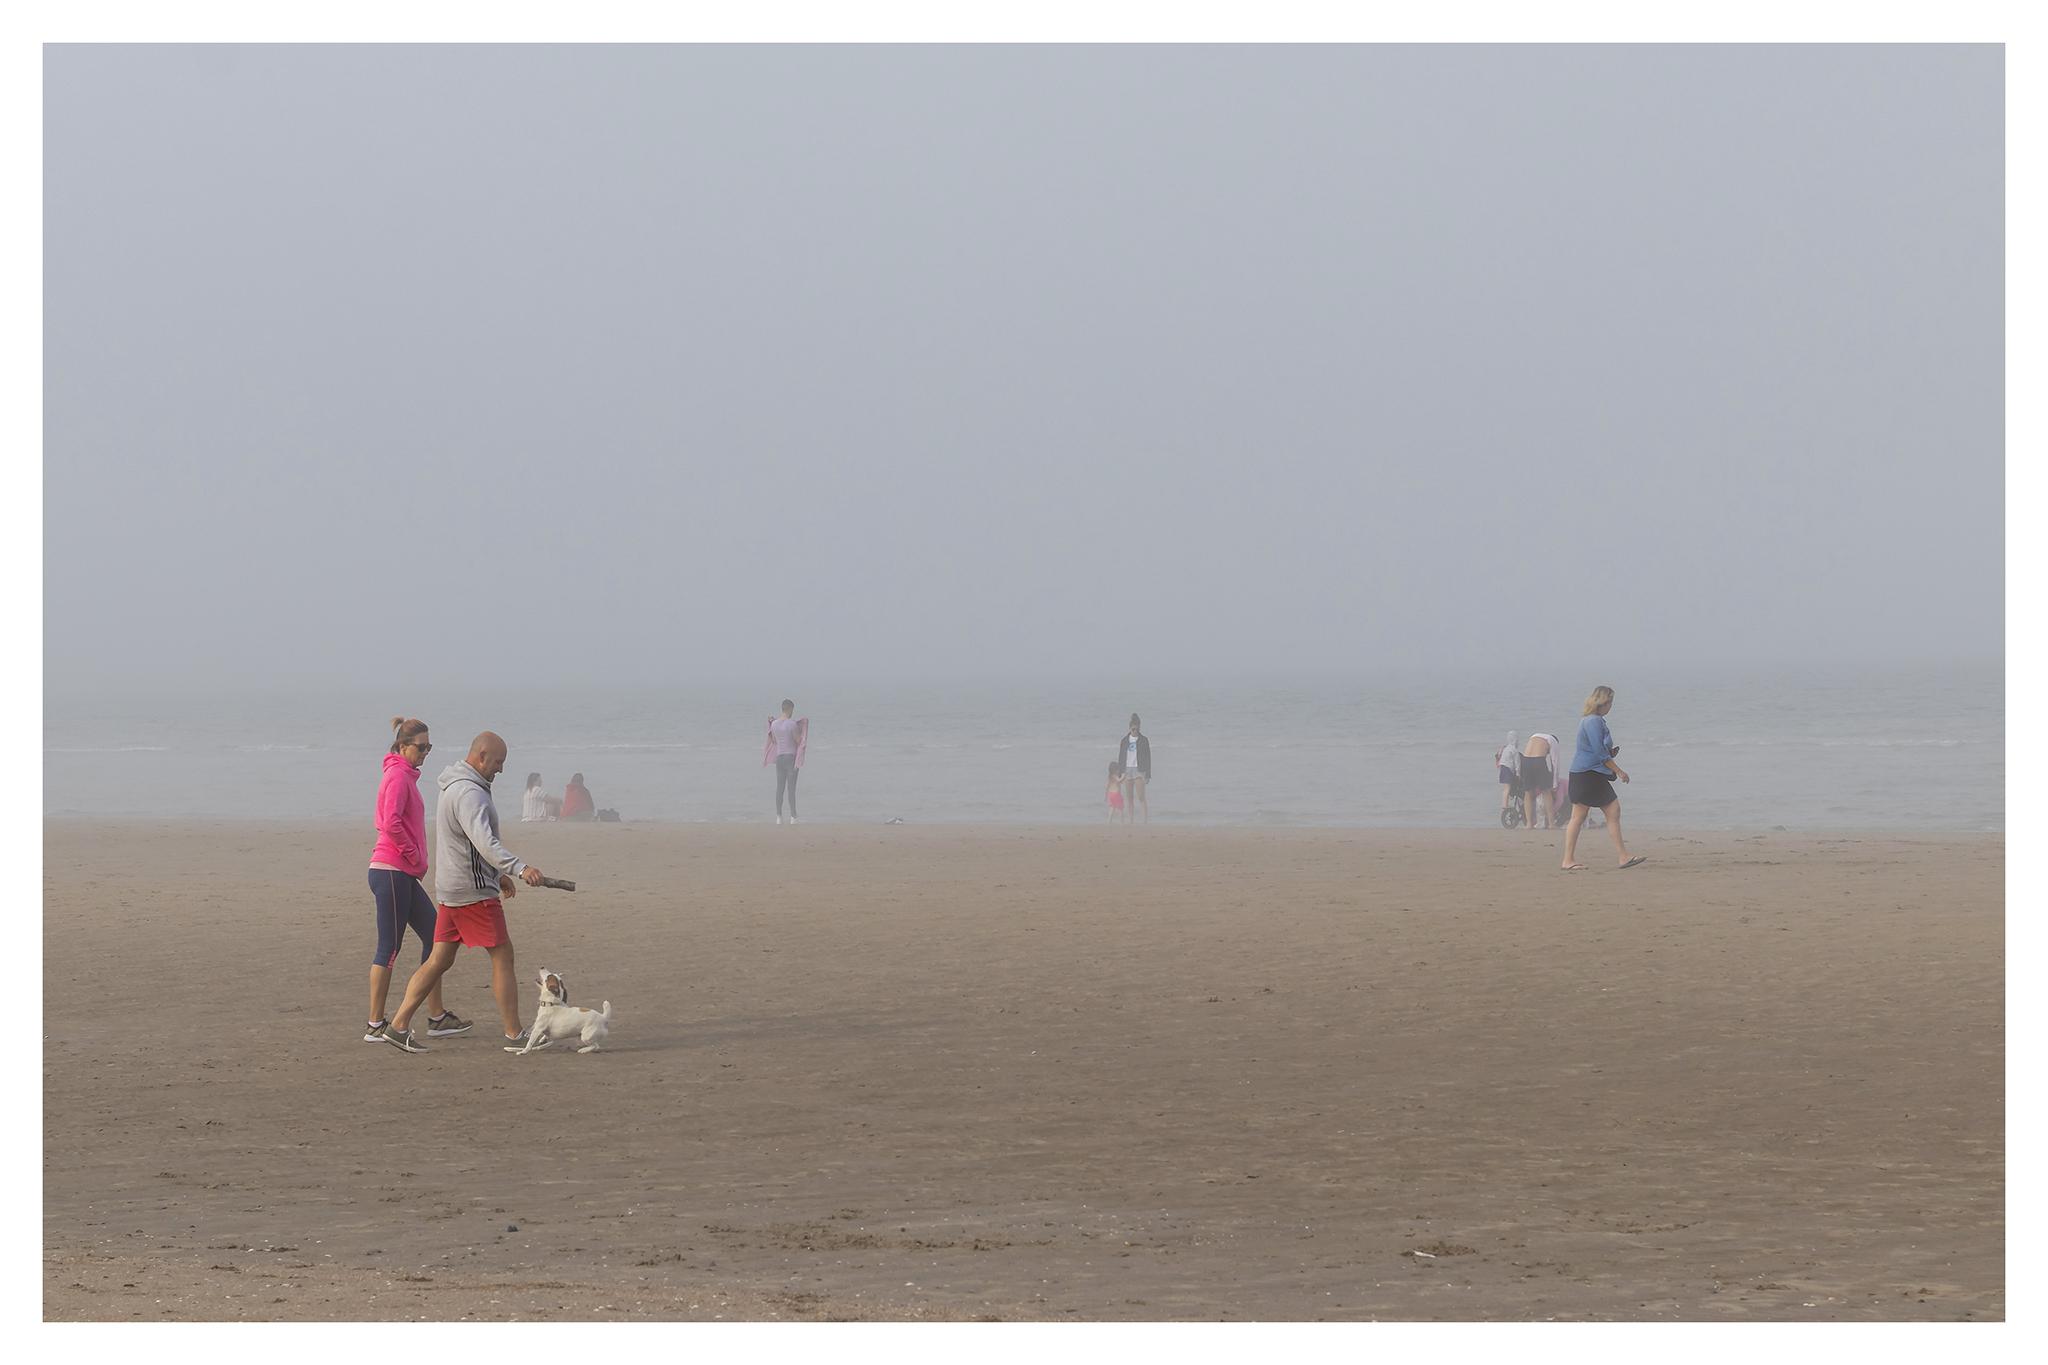 20 - Postcard from a misty Portmarnock